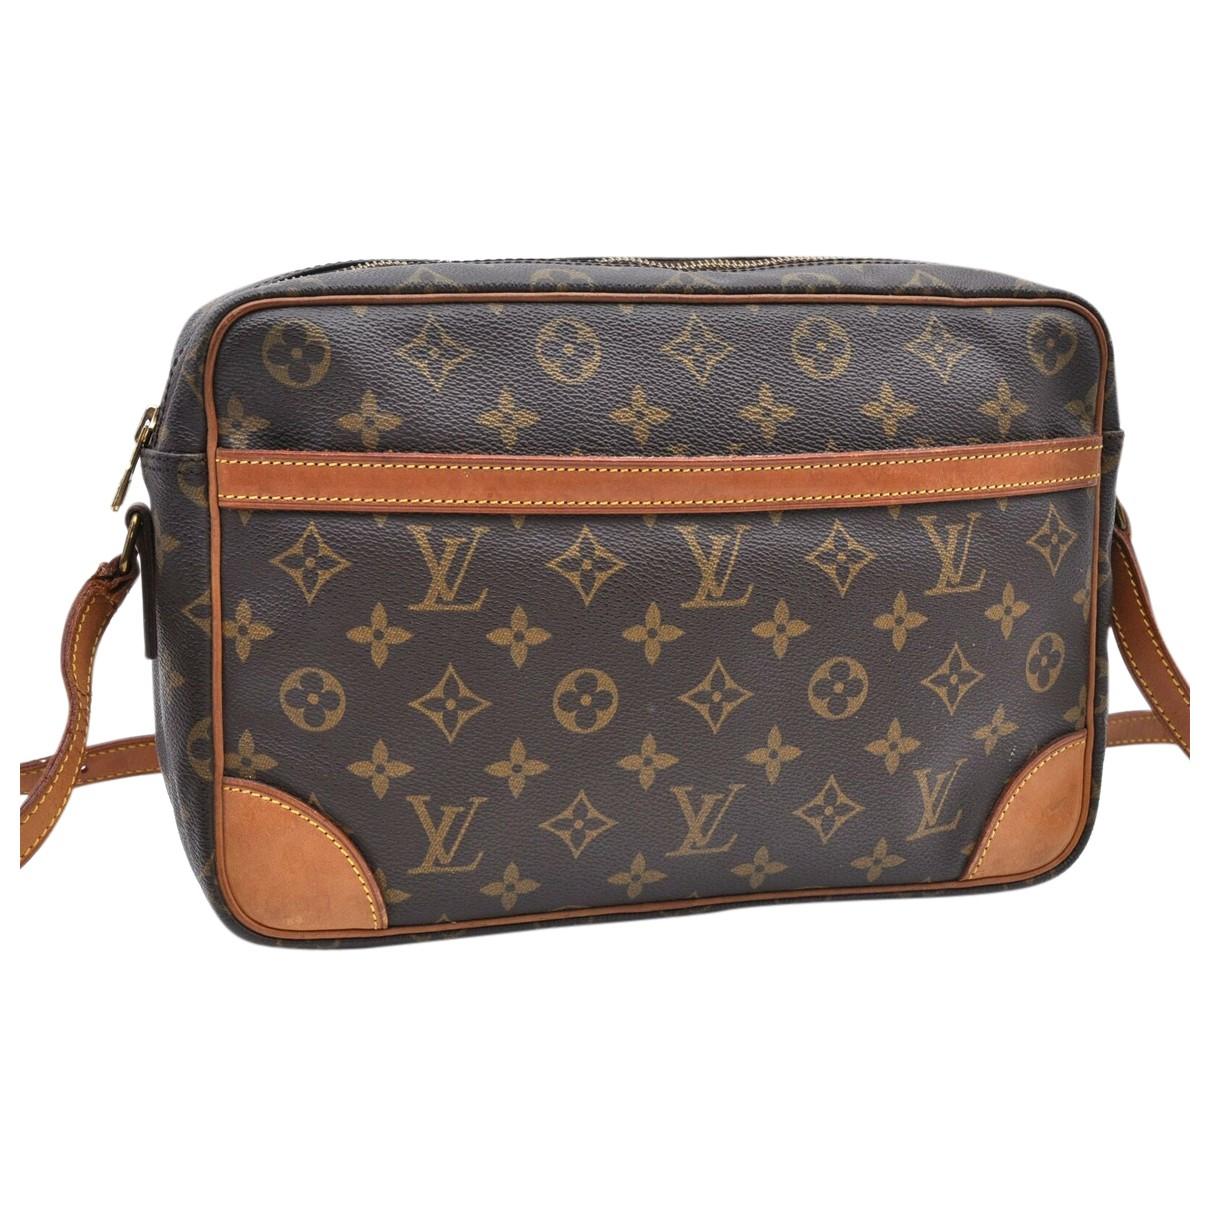 Bolso Trocadero de Lona Louis Vuitton